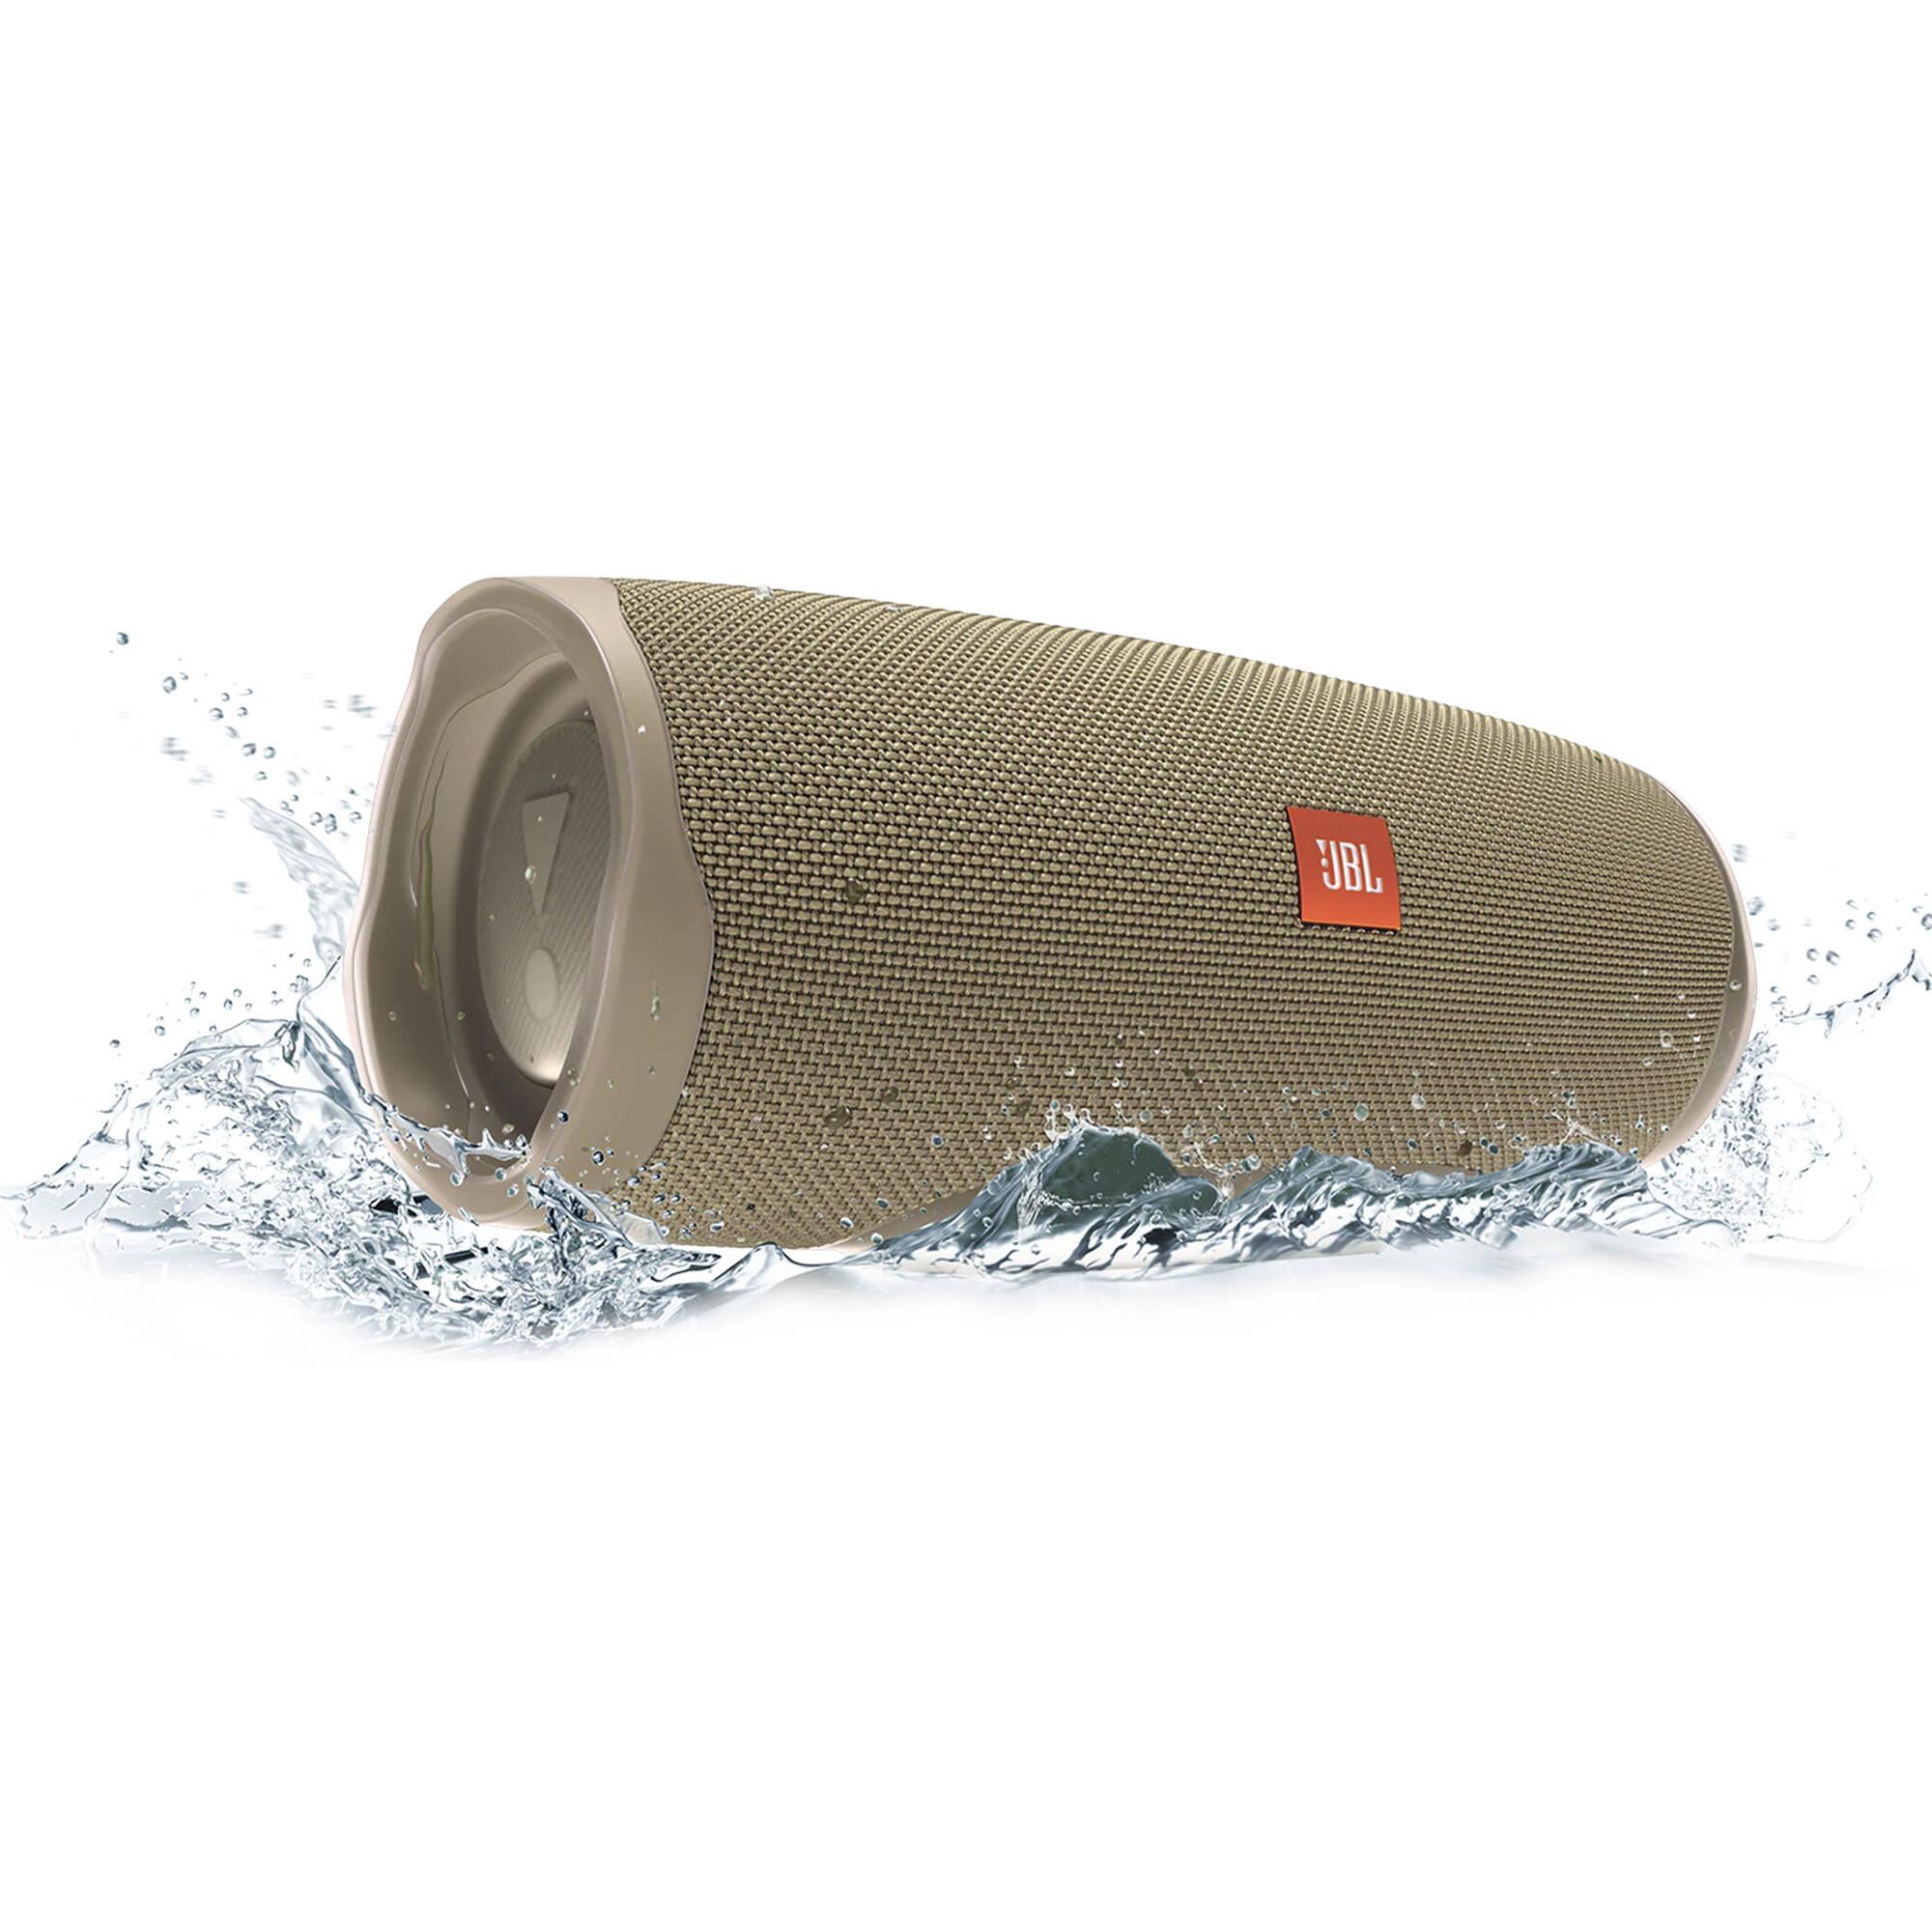 Jbl Charge 4 Portable Bluetooth Speaker Sand Jblcharge4sandam